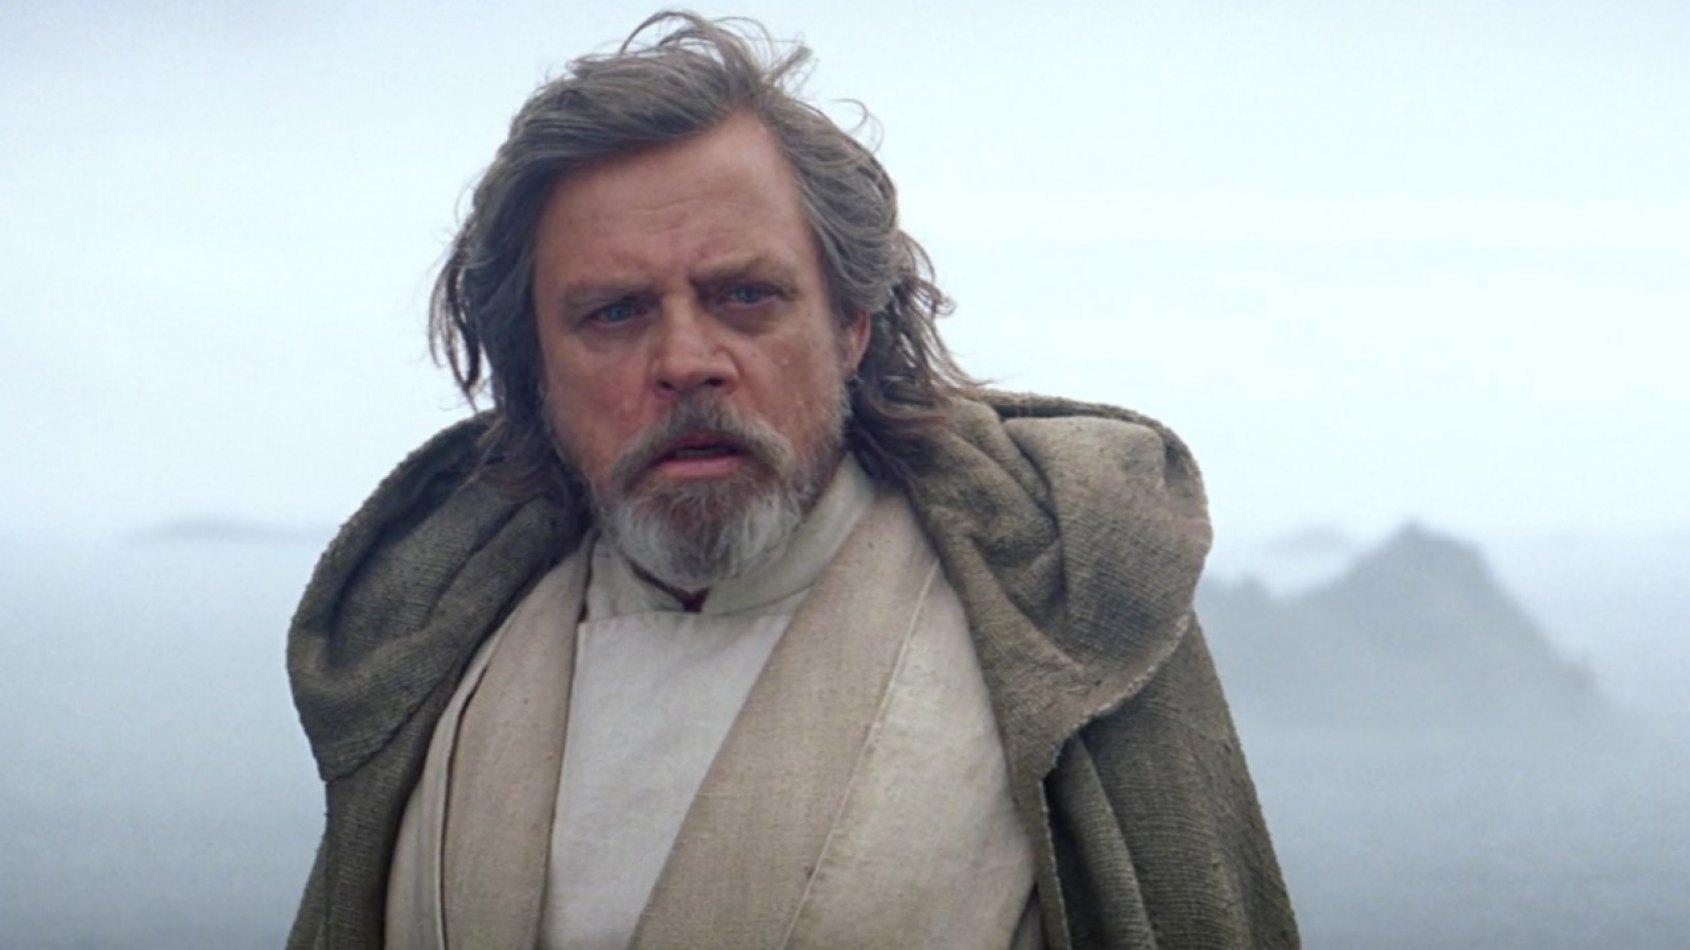 Les acteurs de Star Wars Episode VIII sont arrivés en Irlande